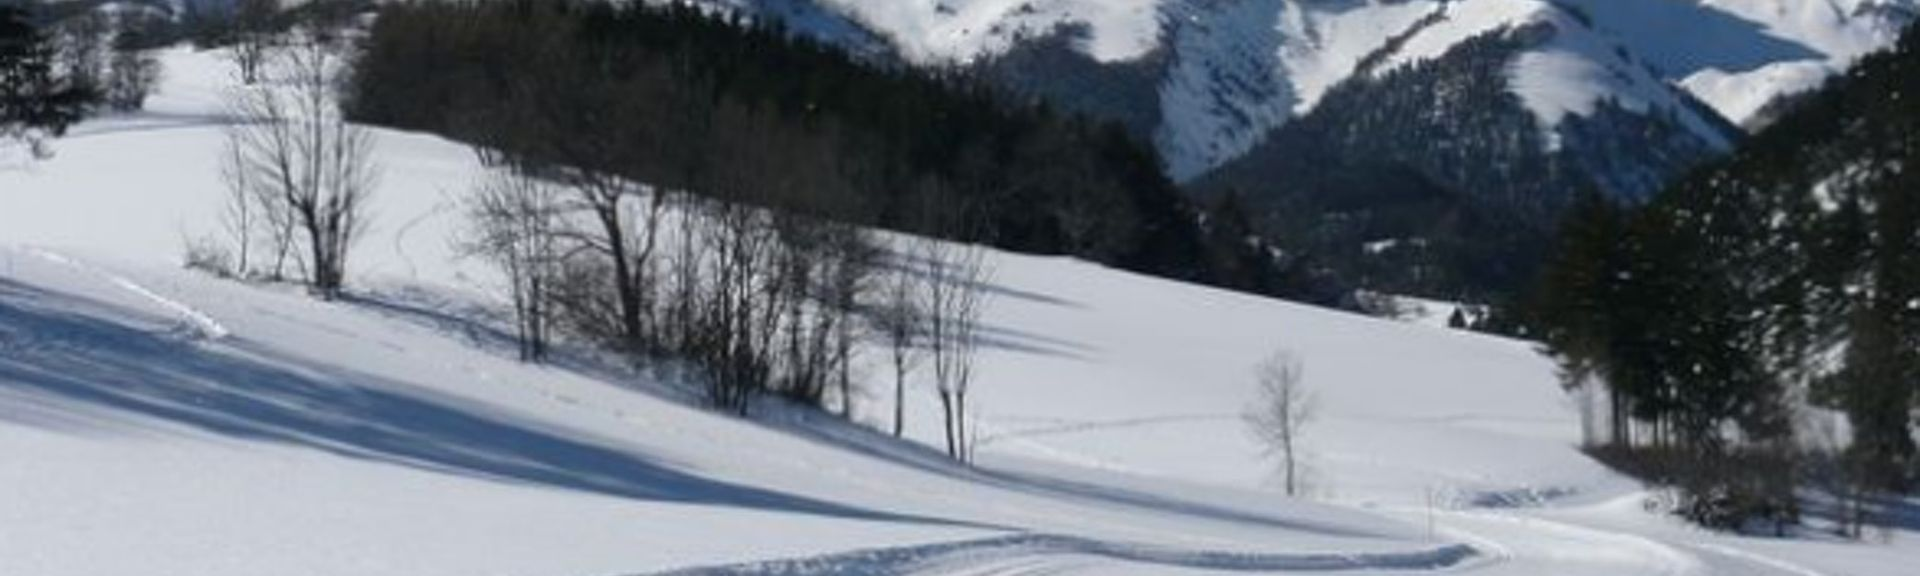 Romeyer, Auvergne-Rhône-Alpes, Frankreich